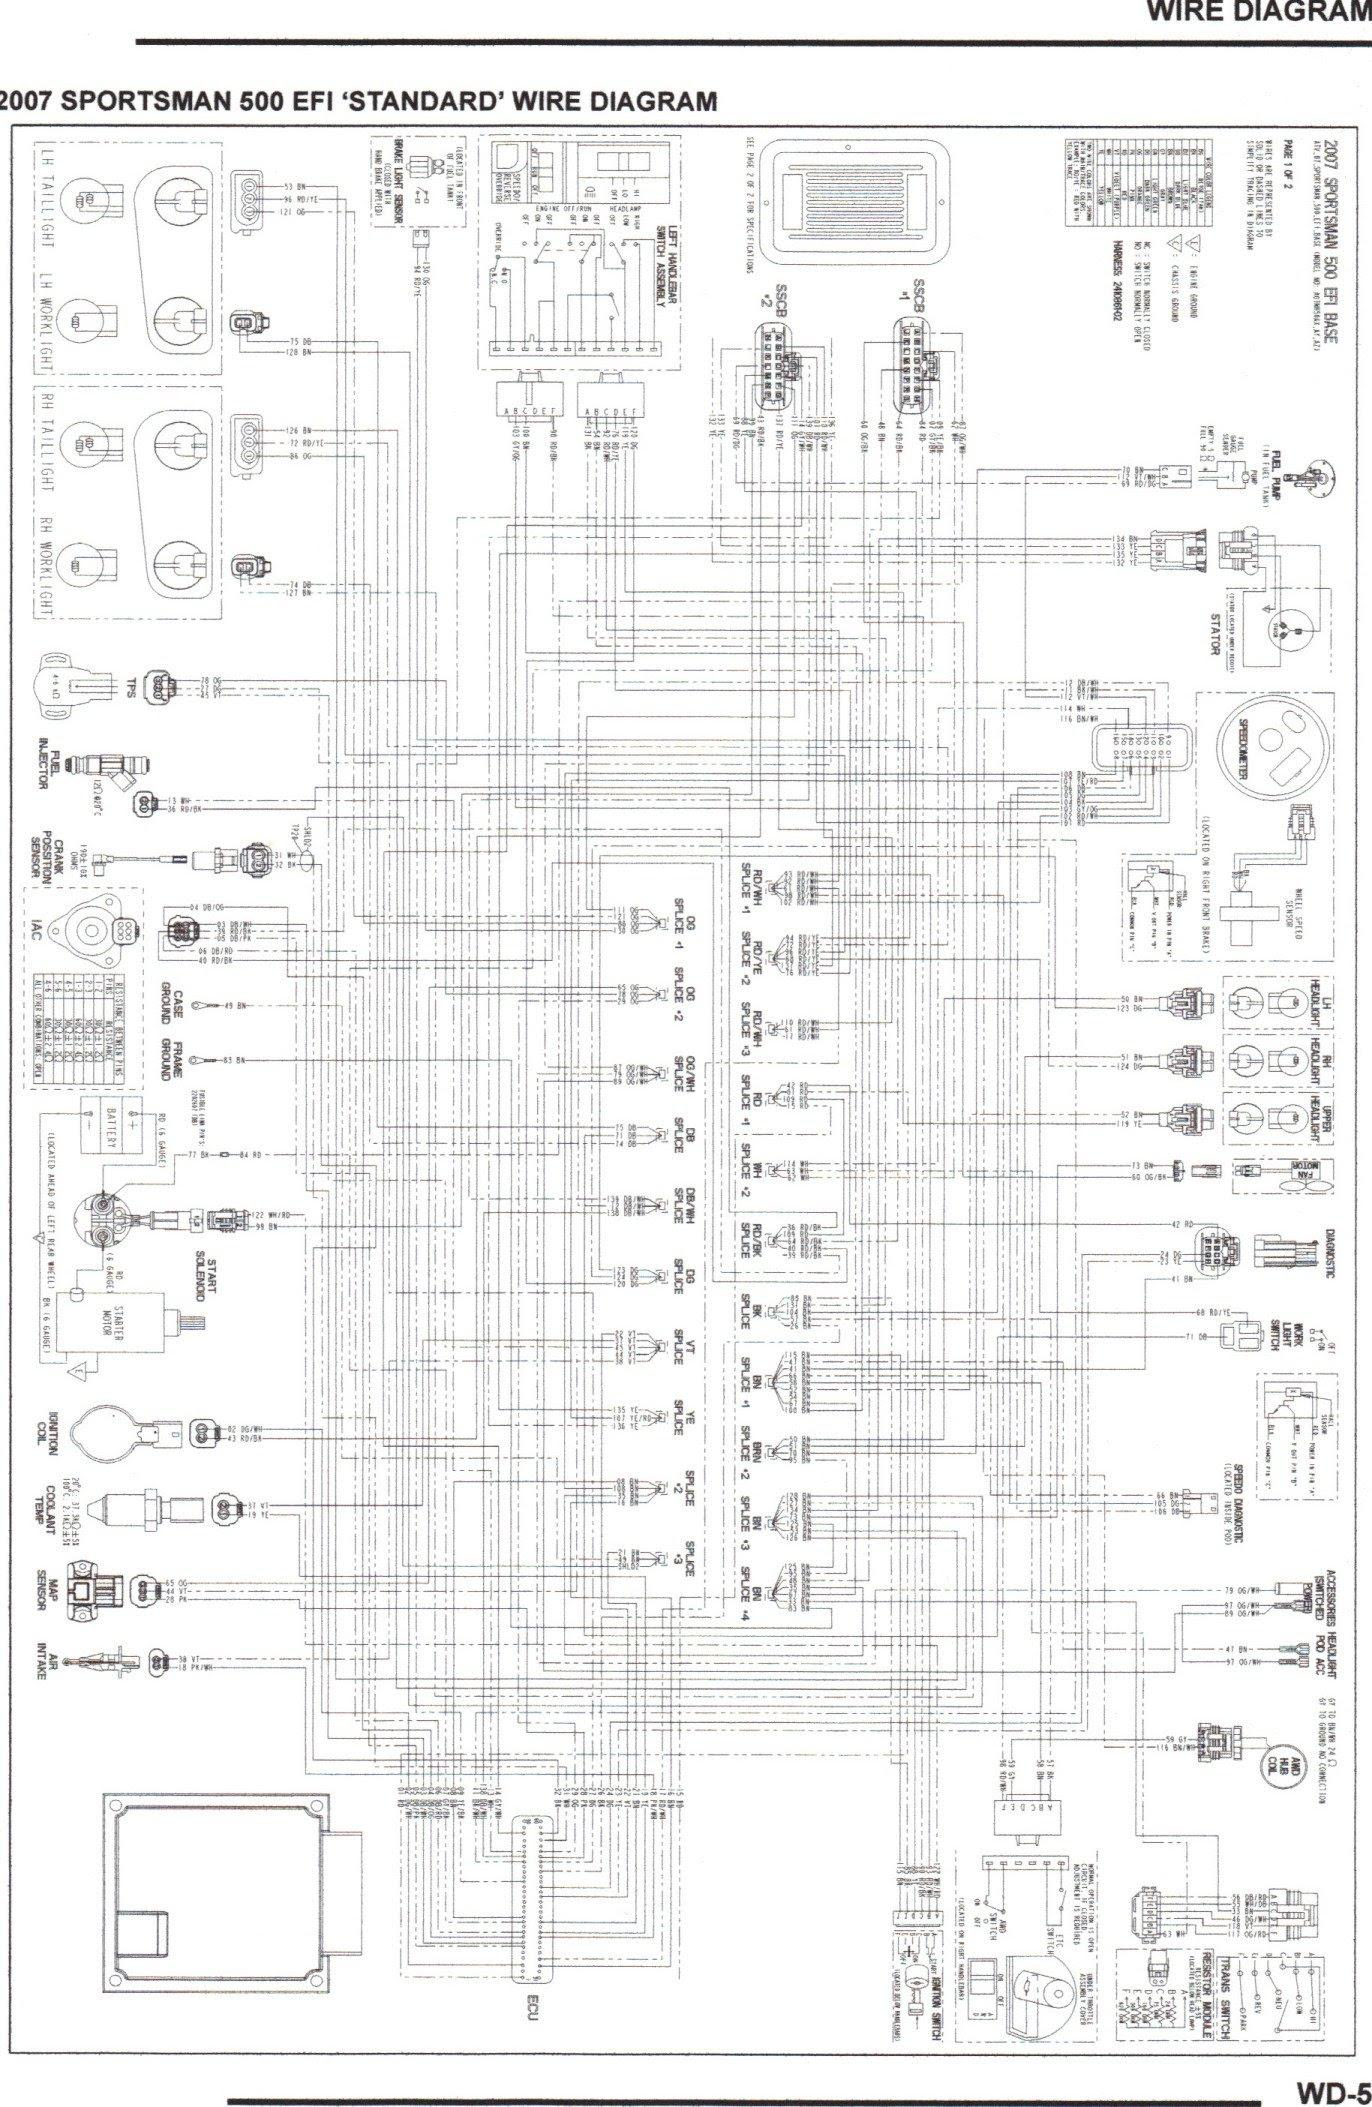 Polaris Sportsman Ignition Wiring Diagram Wiring Diagram Corsa A Corsa A Pasticceriagele It